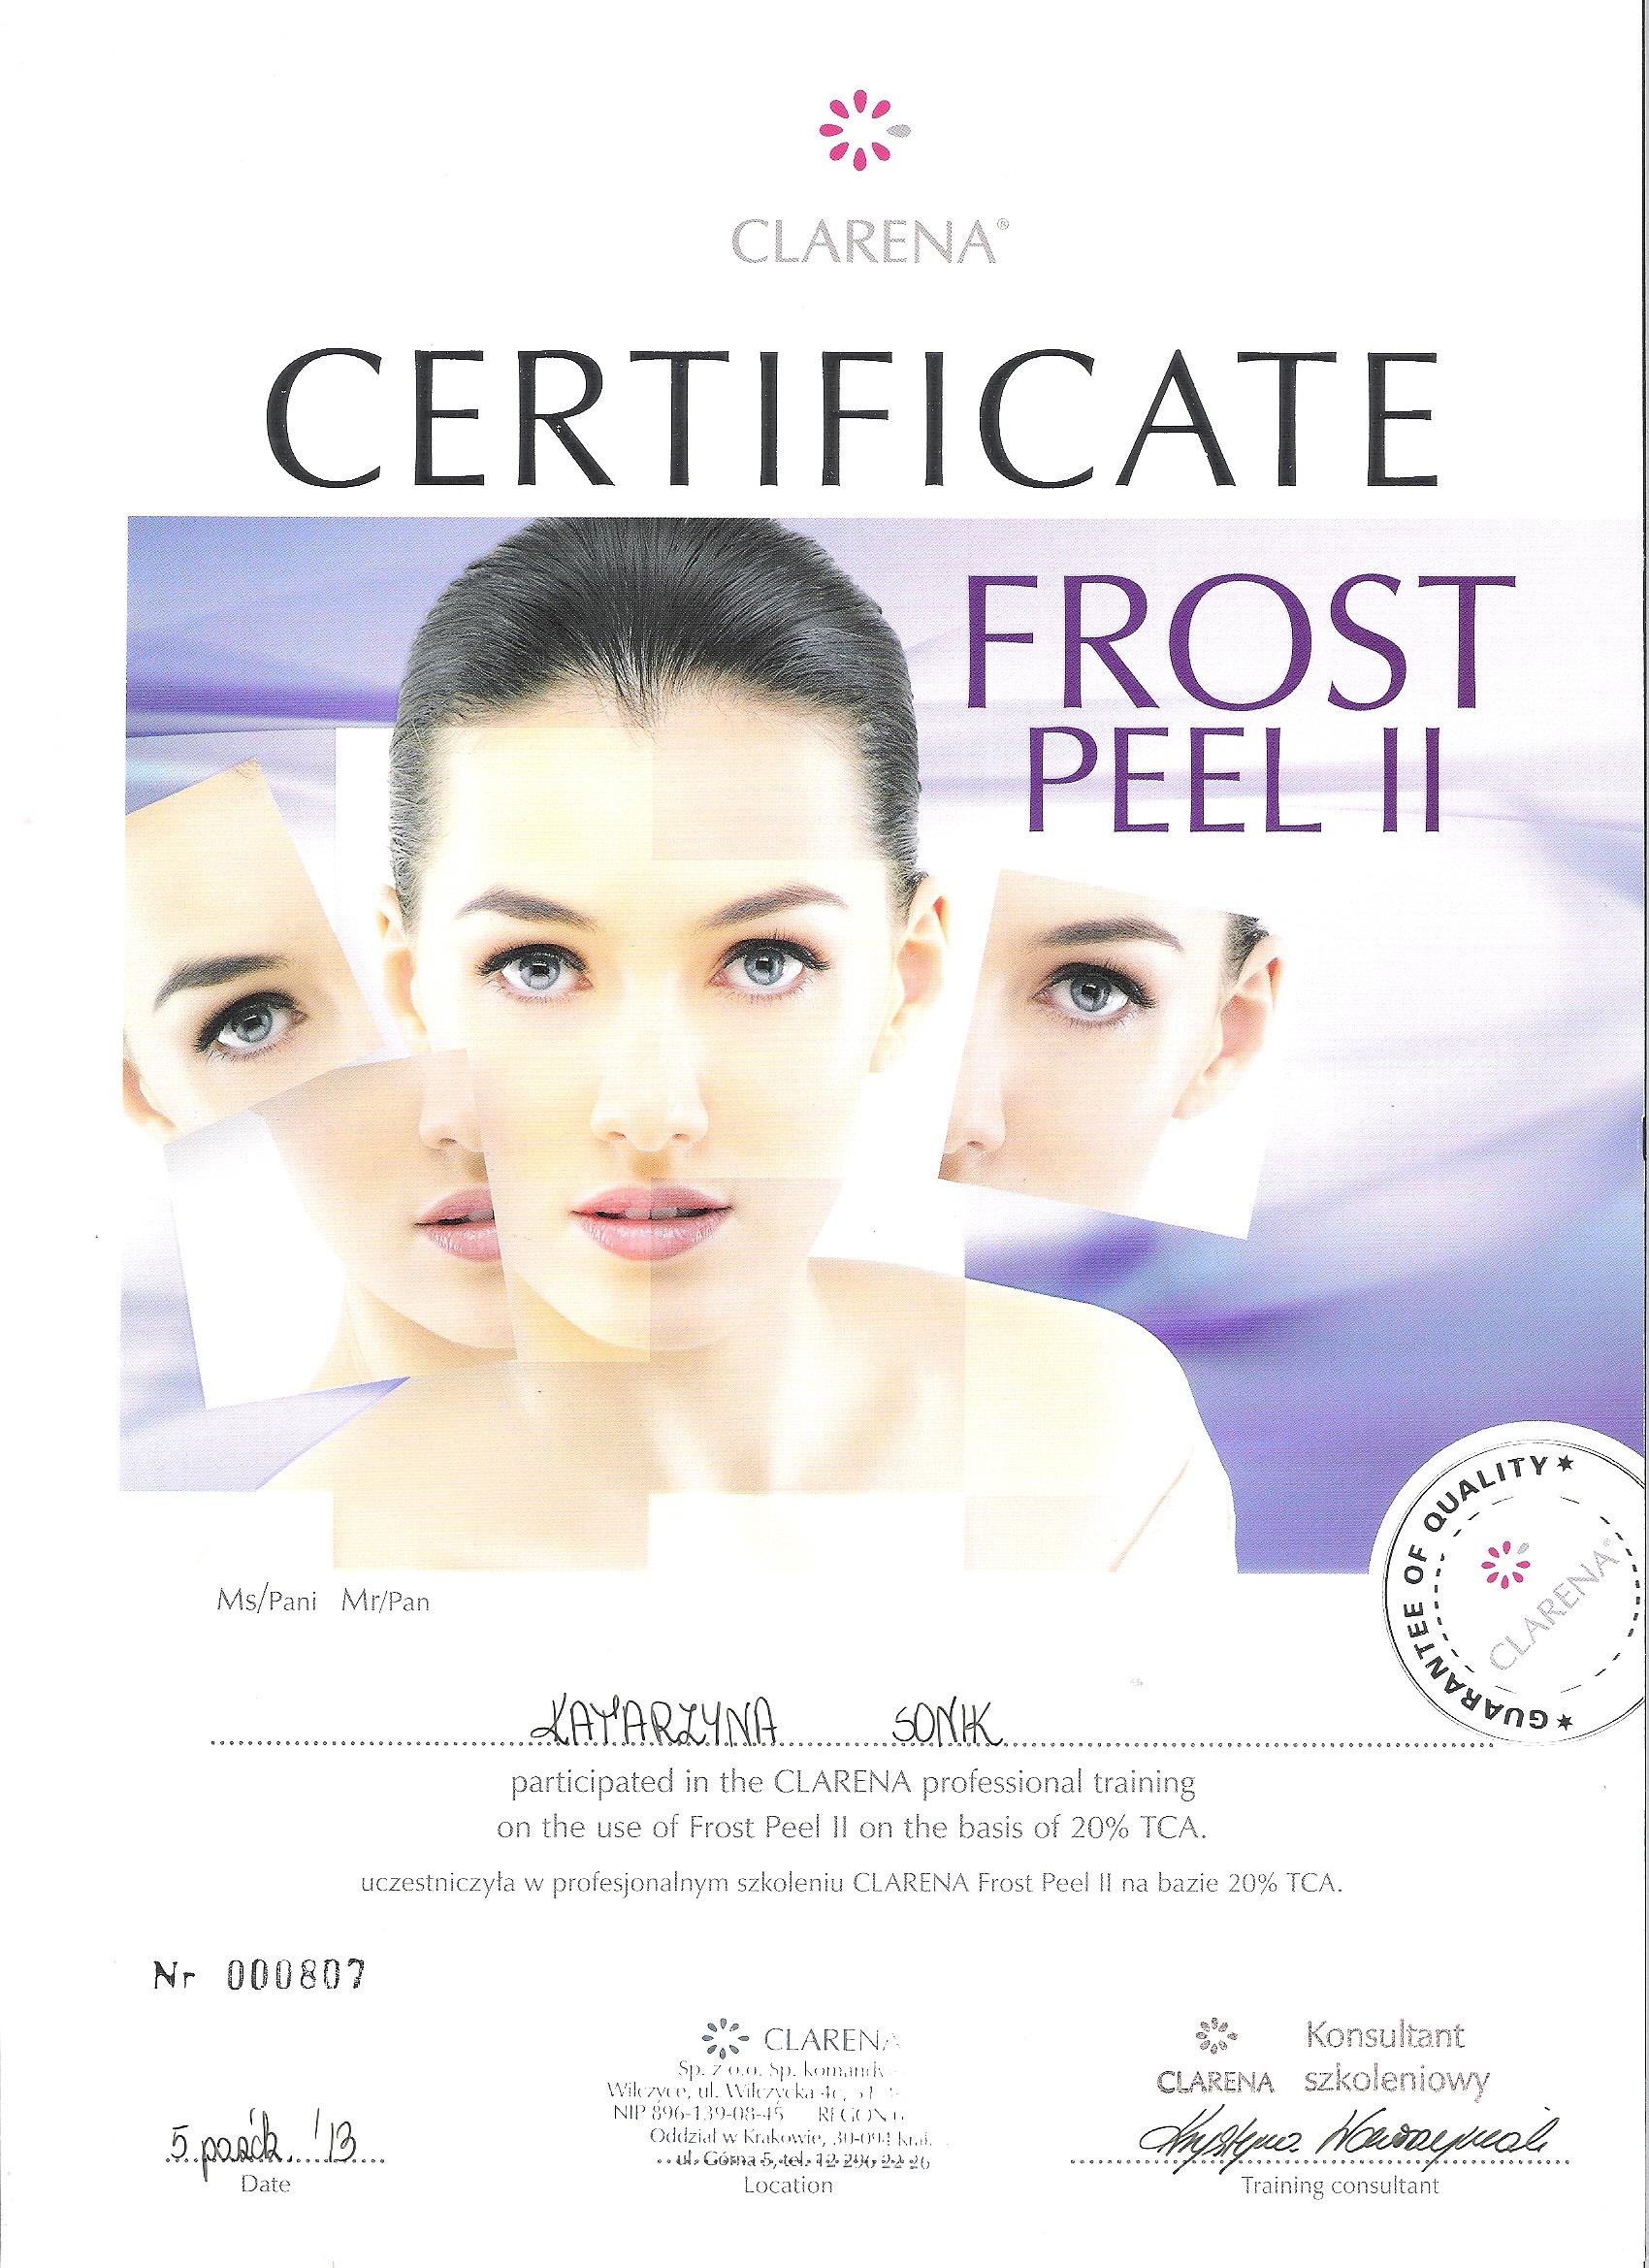 certyfikat frost peel 2